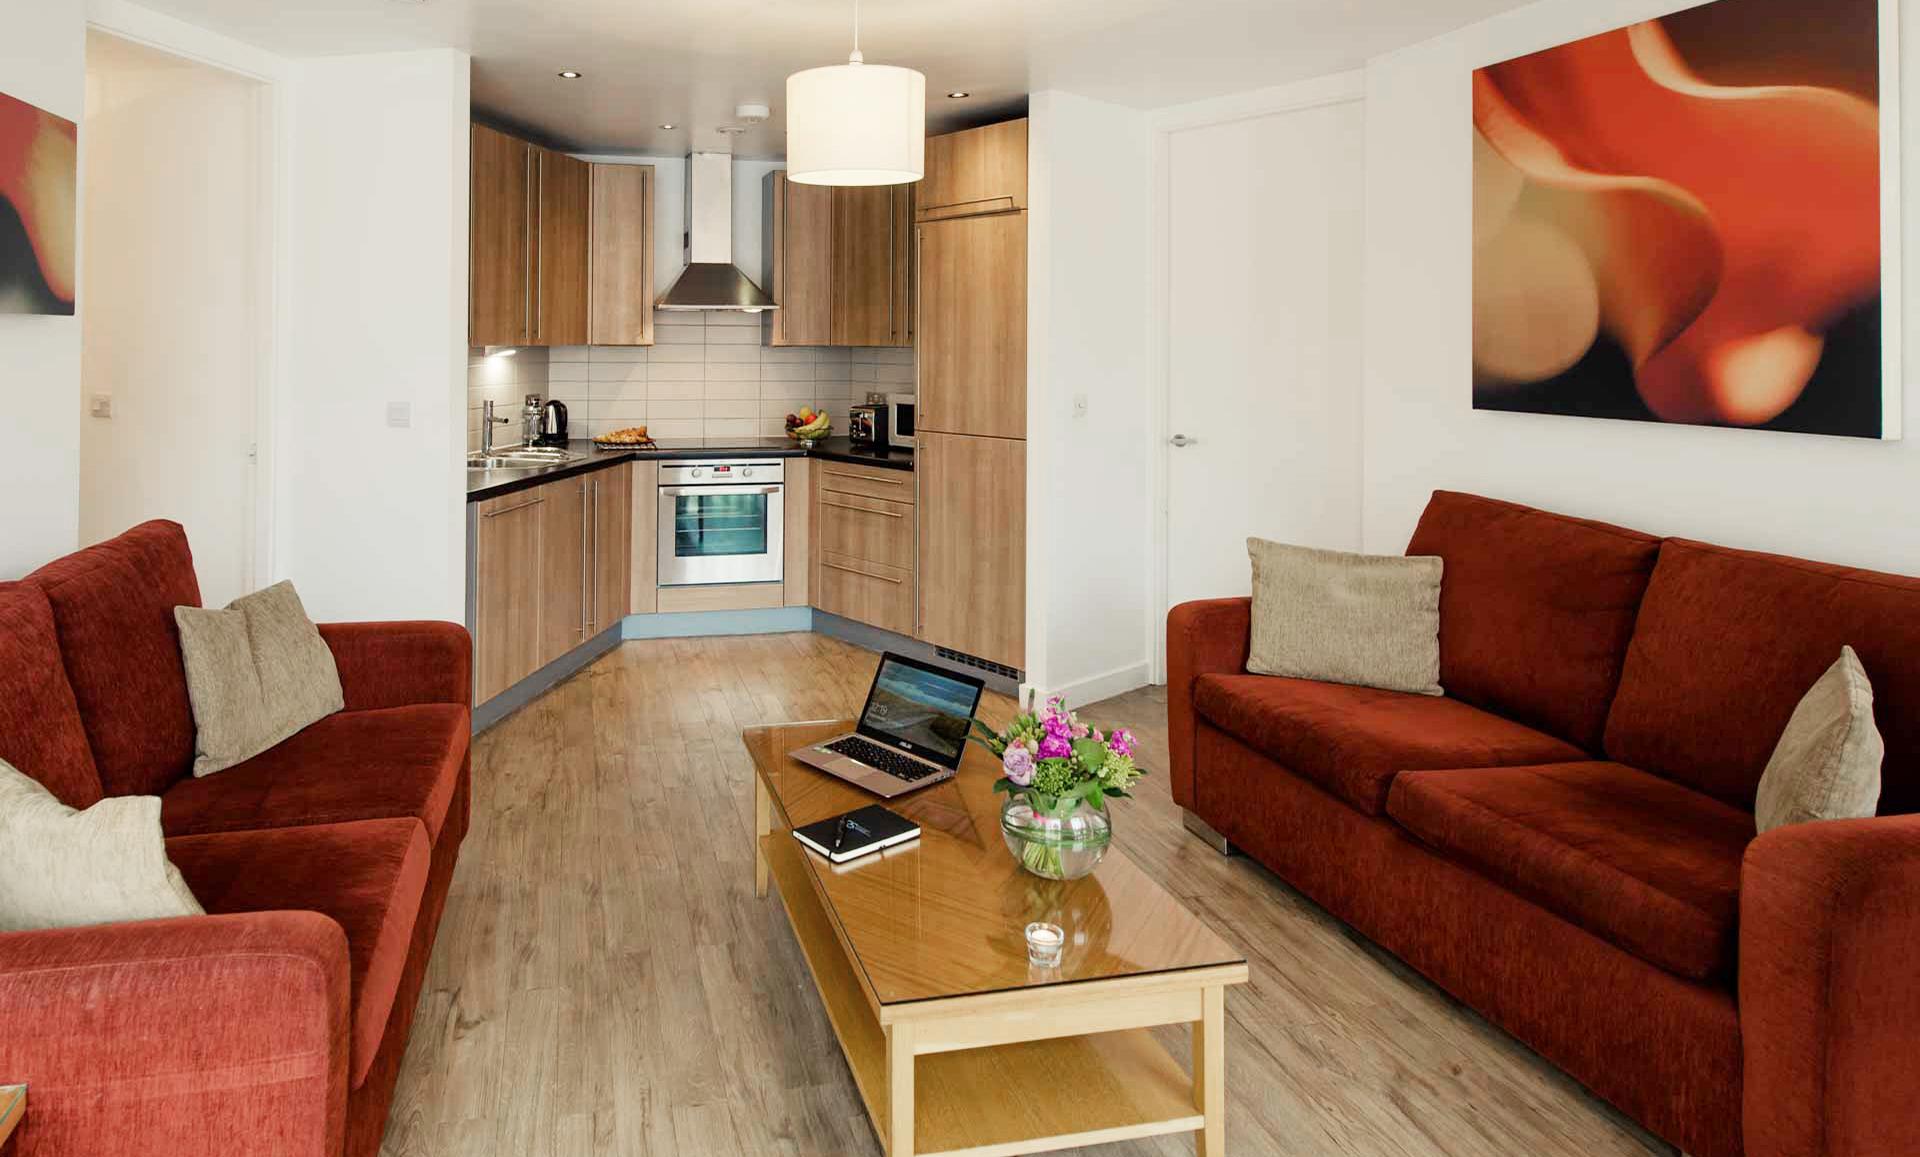 Kitchen area at Premier Suites Liverpool - Citybase Apartments